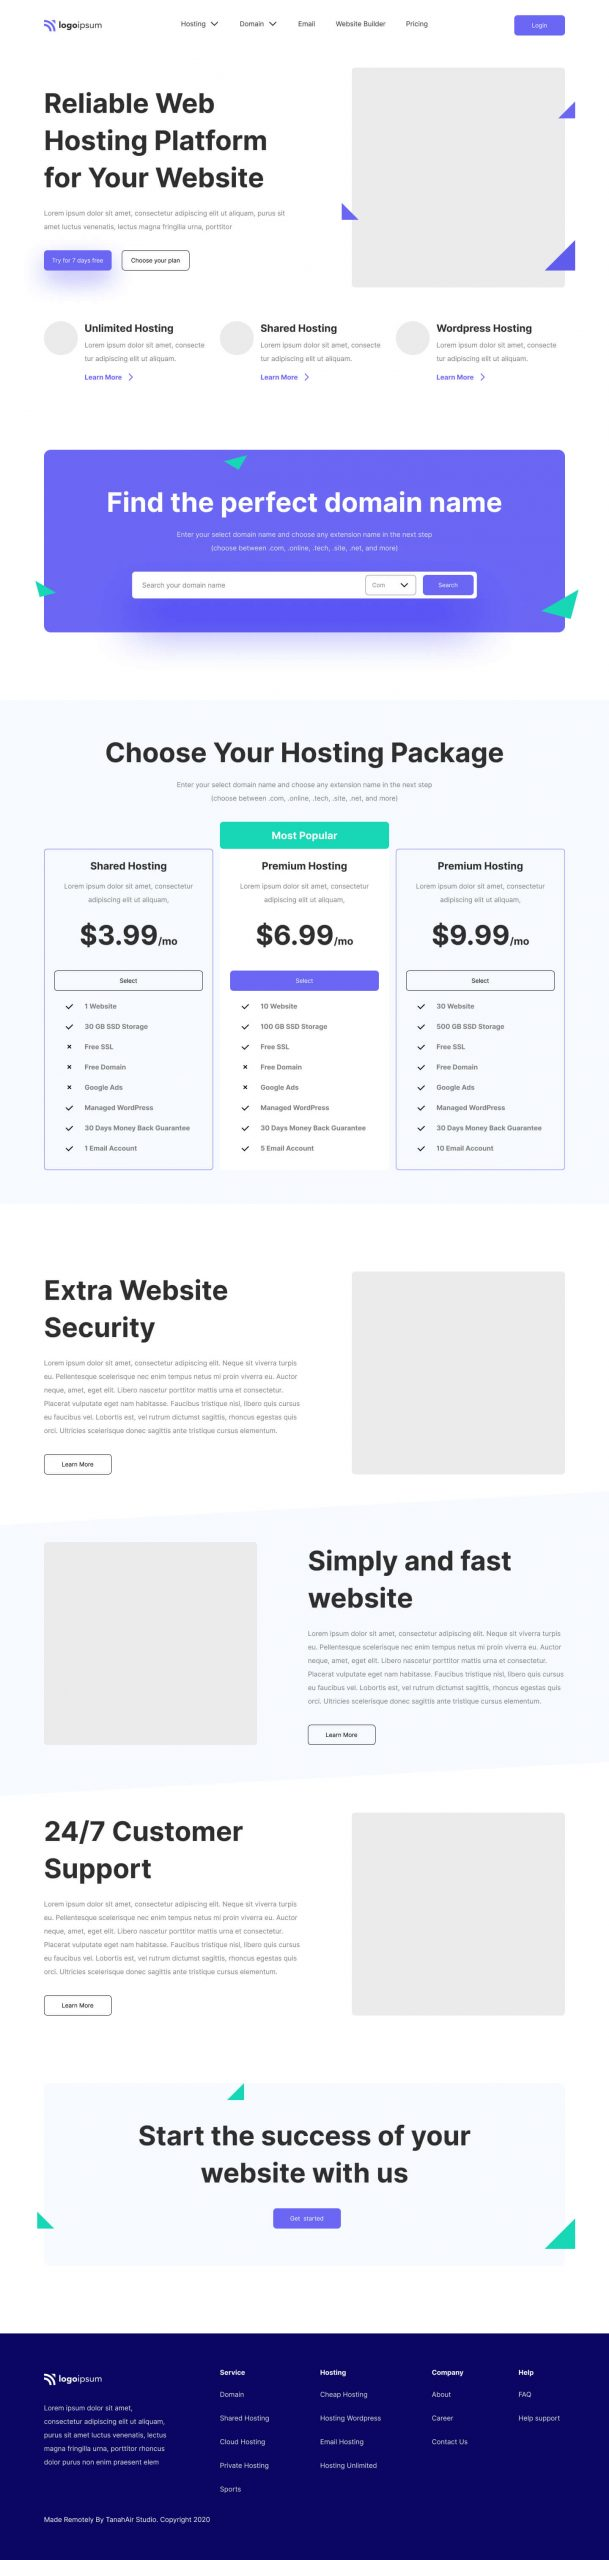 Hosting Service Landing Page Design Free - UI Freebies